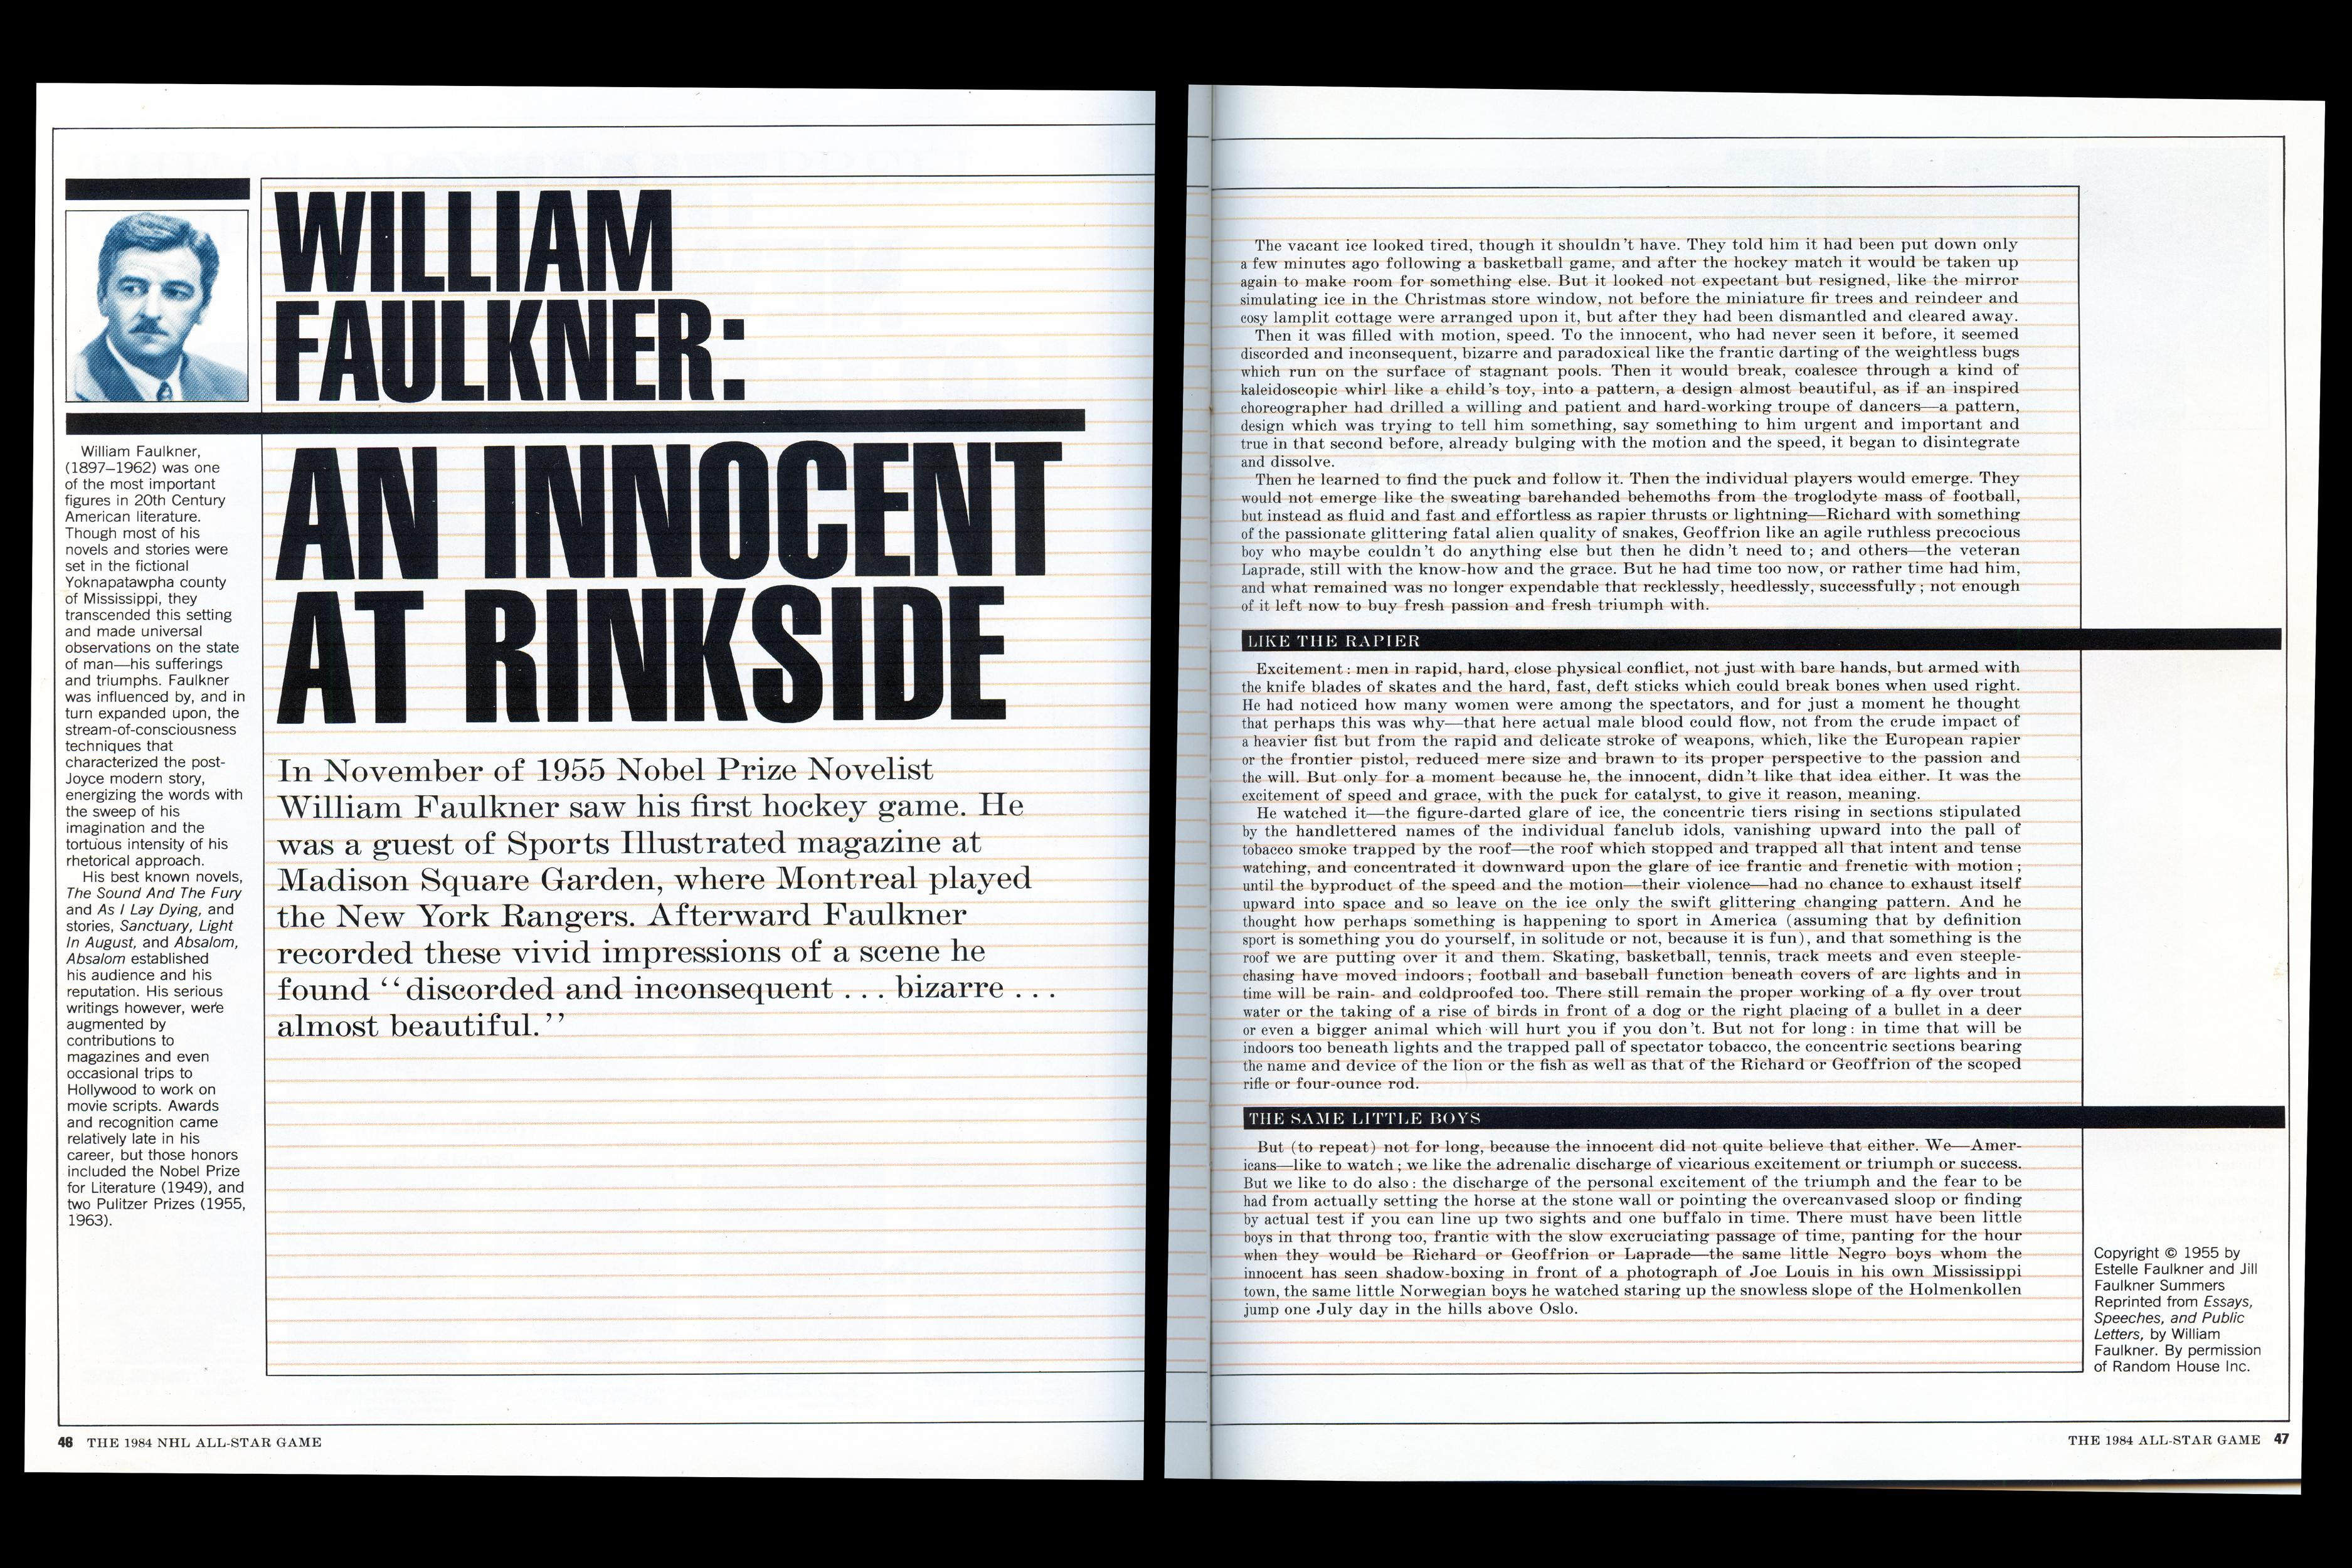 001 Faulkner60 William Faulkner Essays Essay Stunning Topics Full